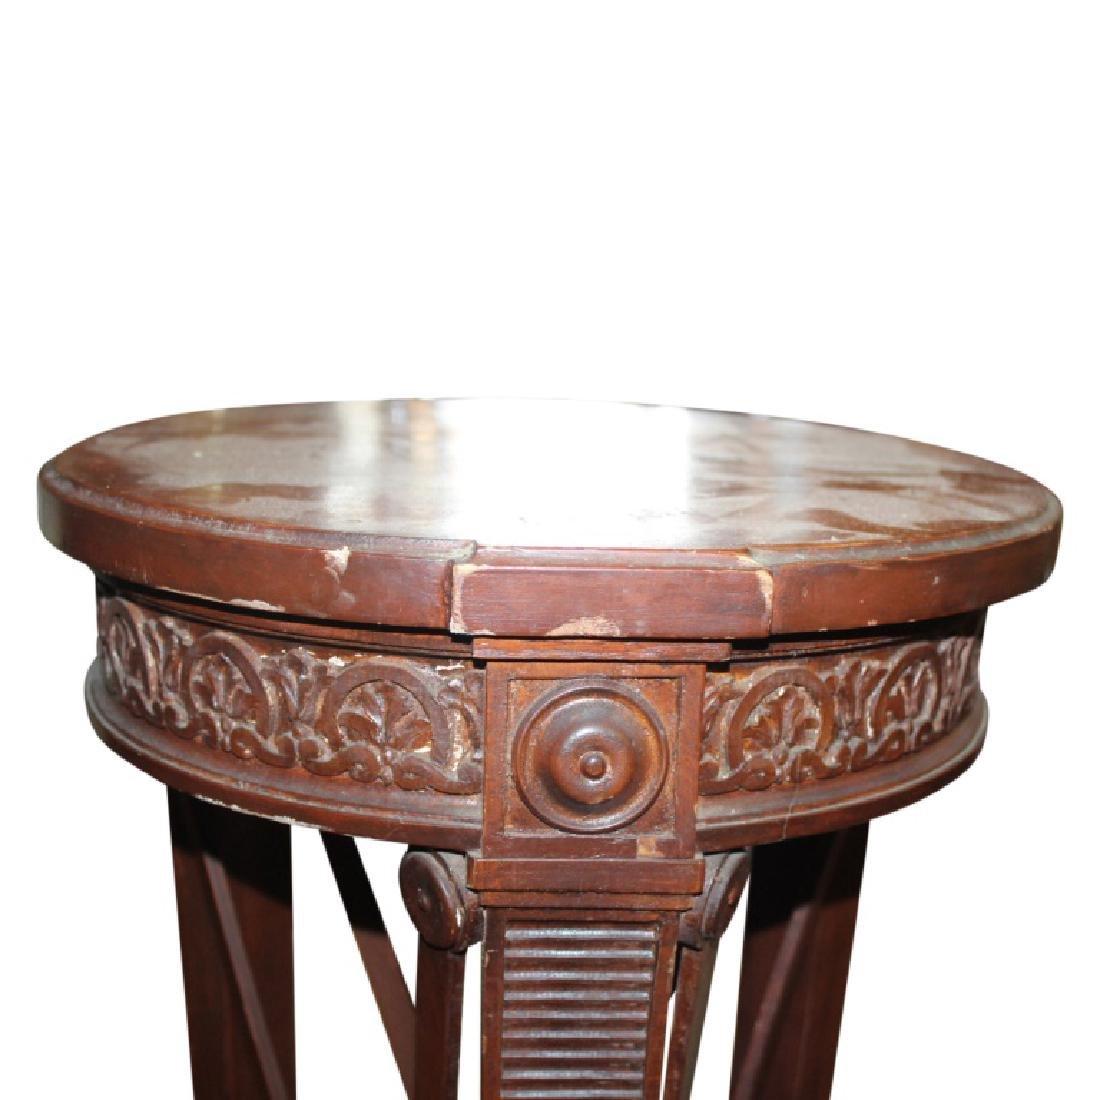 Pair of Georgian Style Pedestals - 5